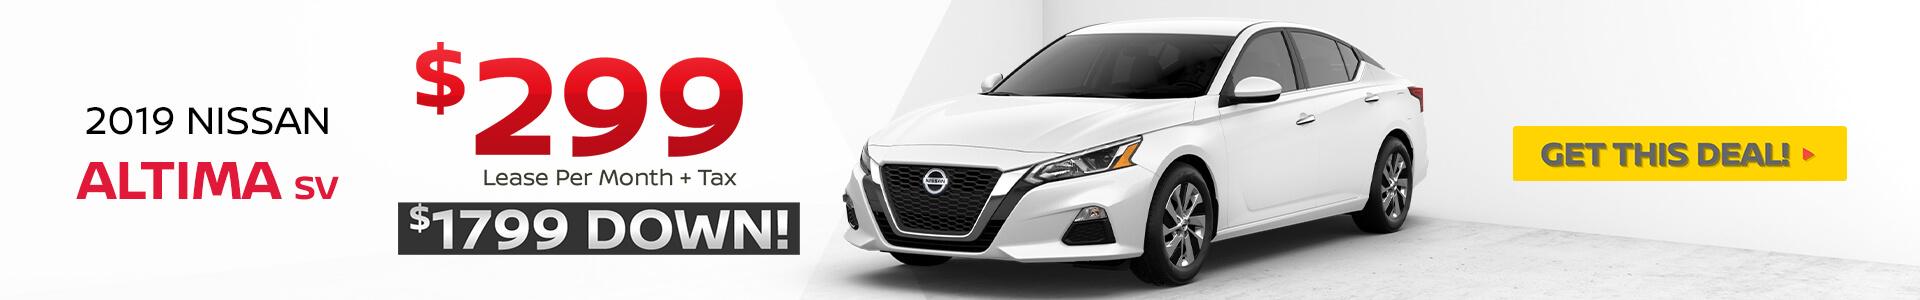 2019 Nissan Altima Lease $299